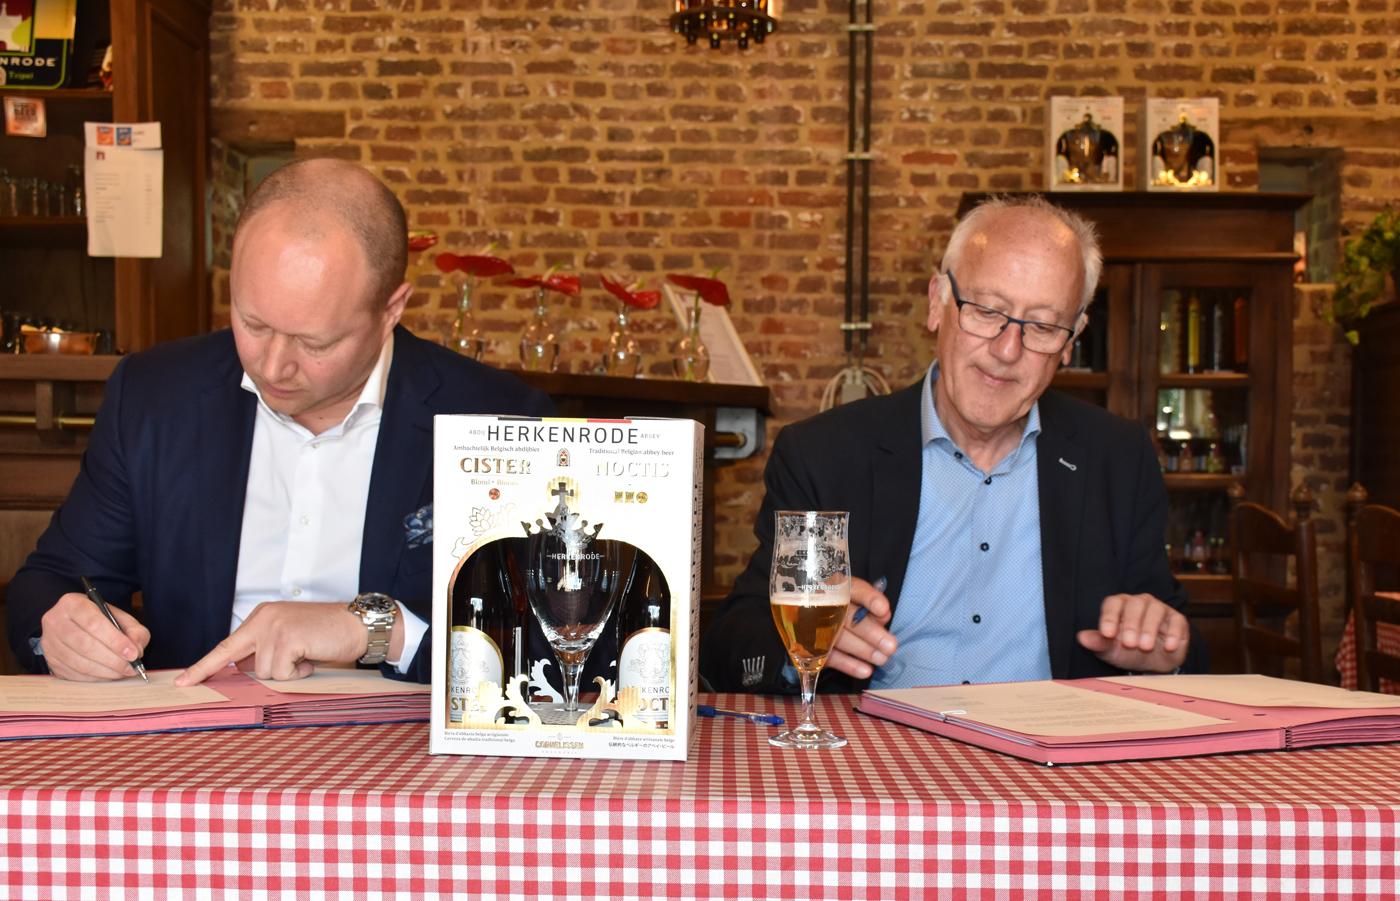 Ondertekening-samenwerking-Brouwer-Jef-Jr-Cornelissen-en-vzw-Herkenrode-vz-Willy-Orlandini